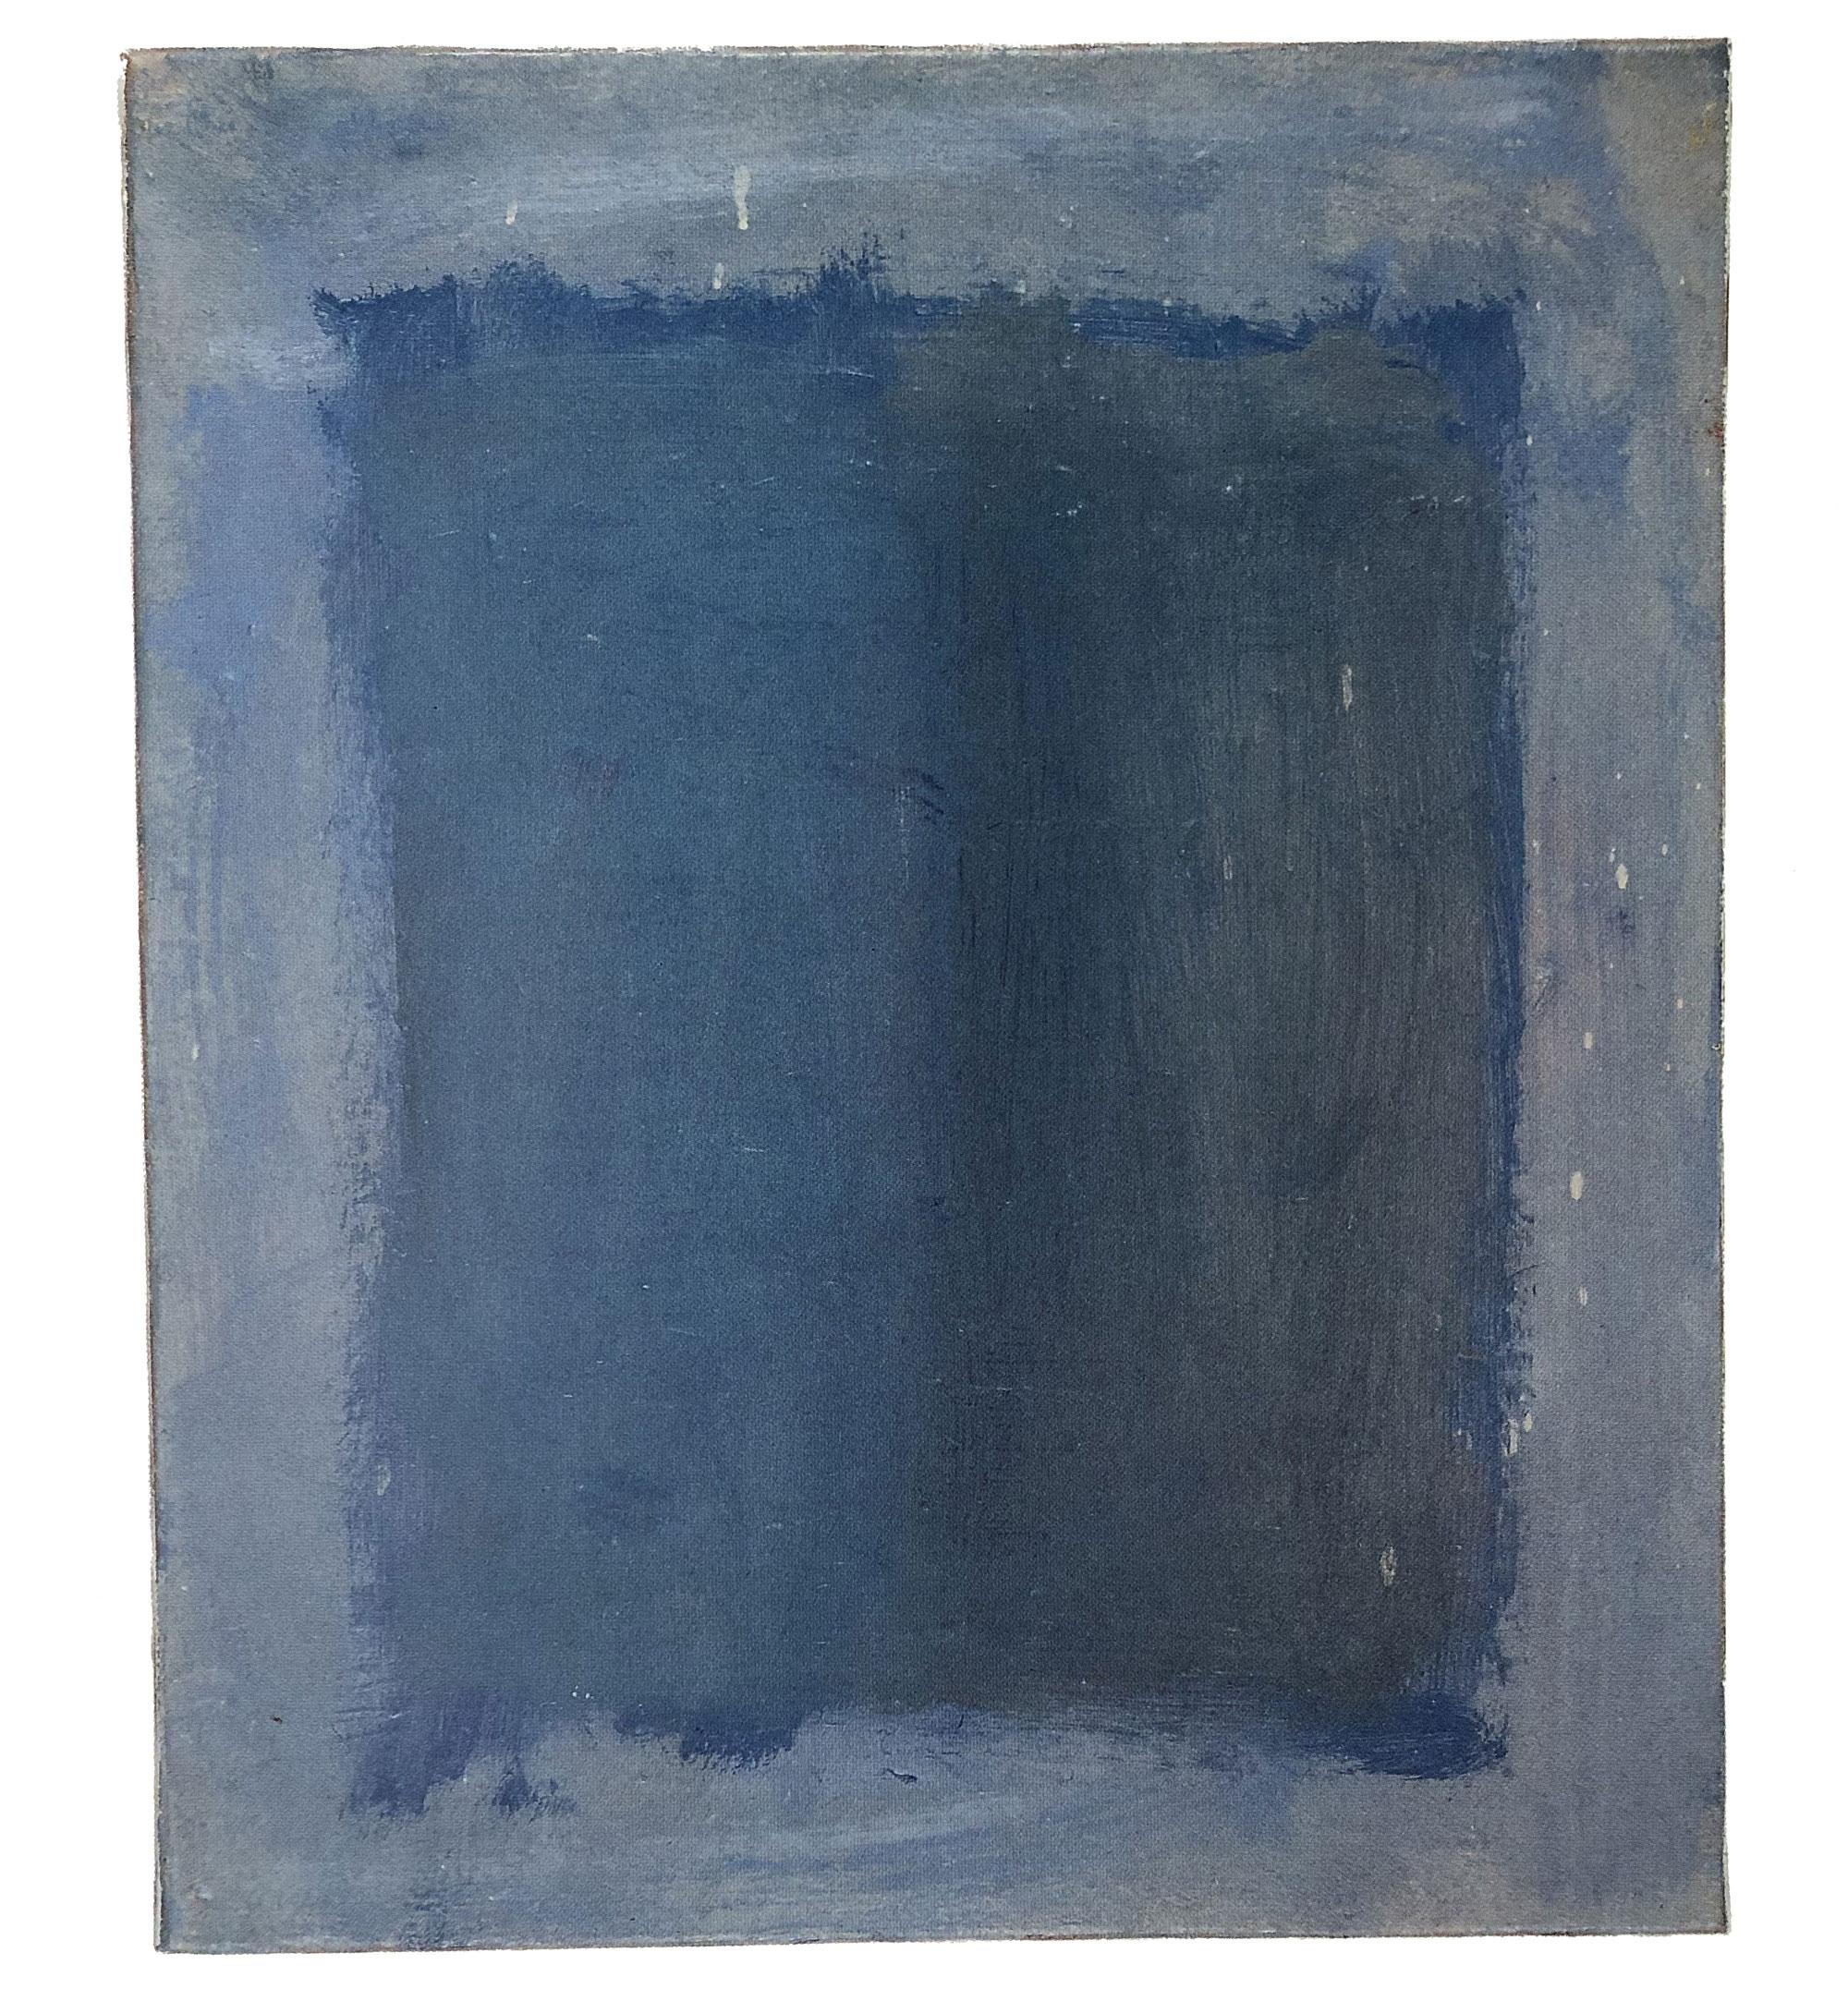 Monochrom-ohne-Titel-1-Öl-auf-Leinwand-50×70-1995